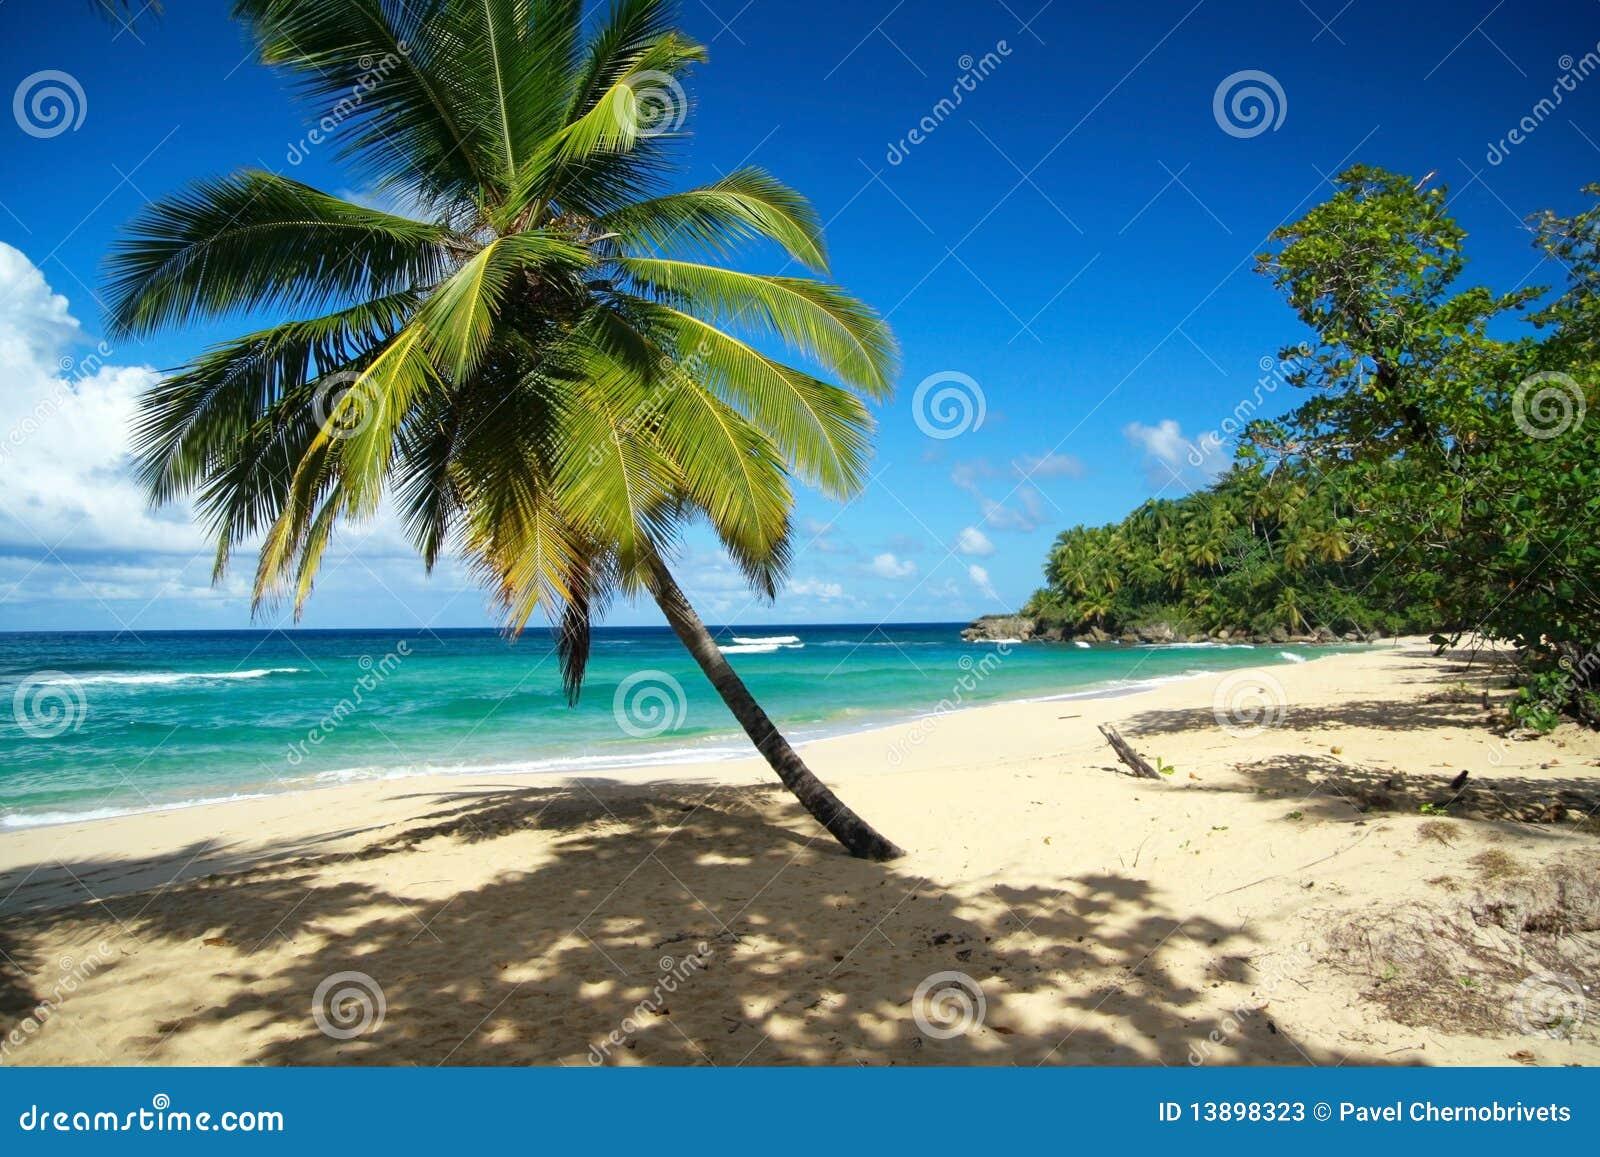 Ruhiger Strand mit Palme